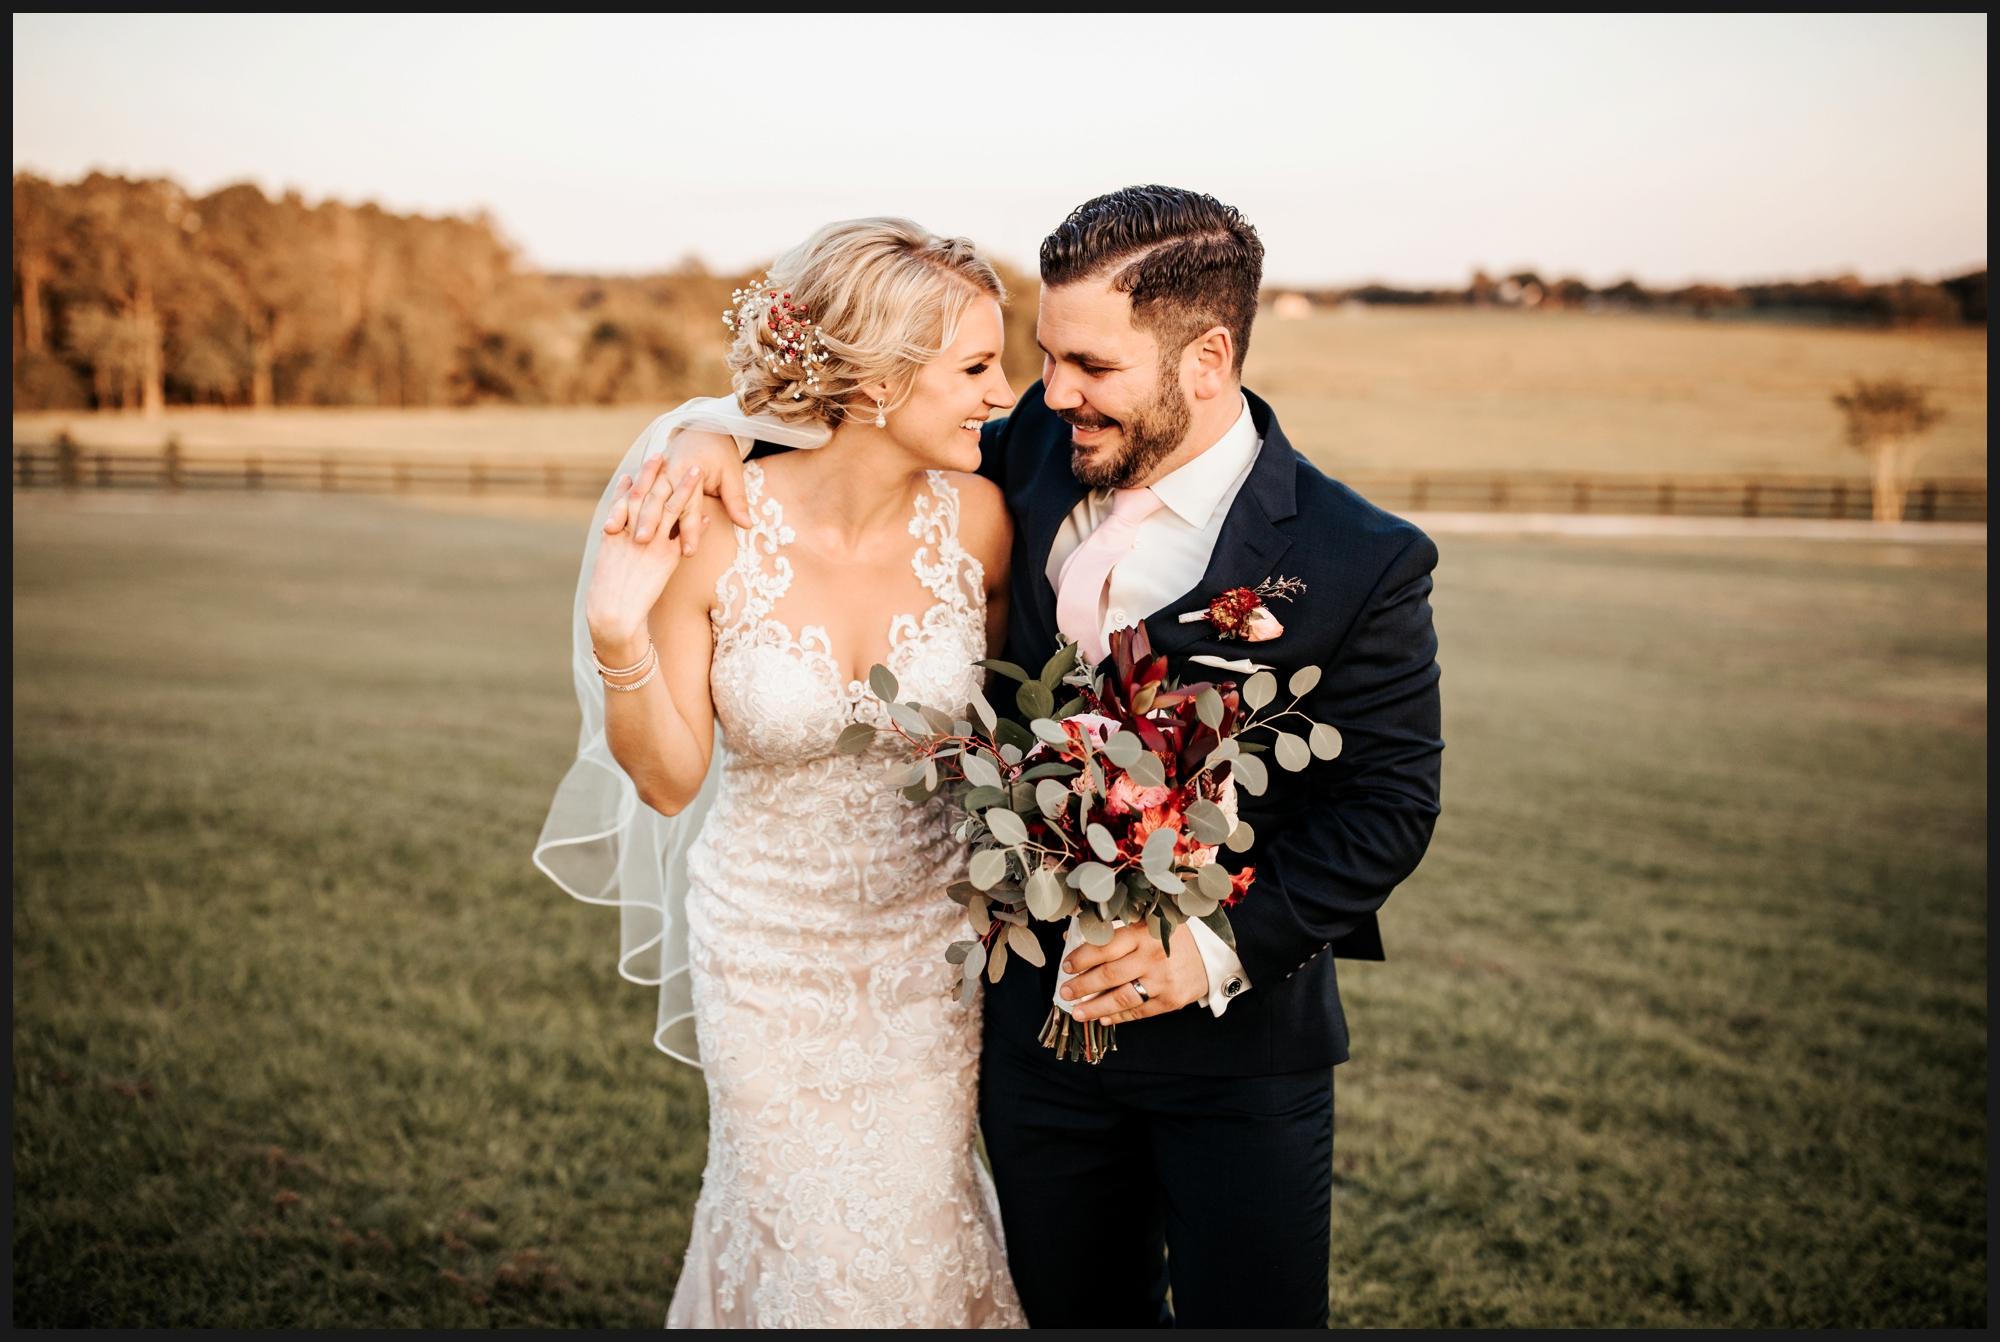 Orlando-Wedding-Photographer-destination-wedding-photographer-florida-wedding-photographer-hawaii-wedding-photographer_0616.jpg